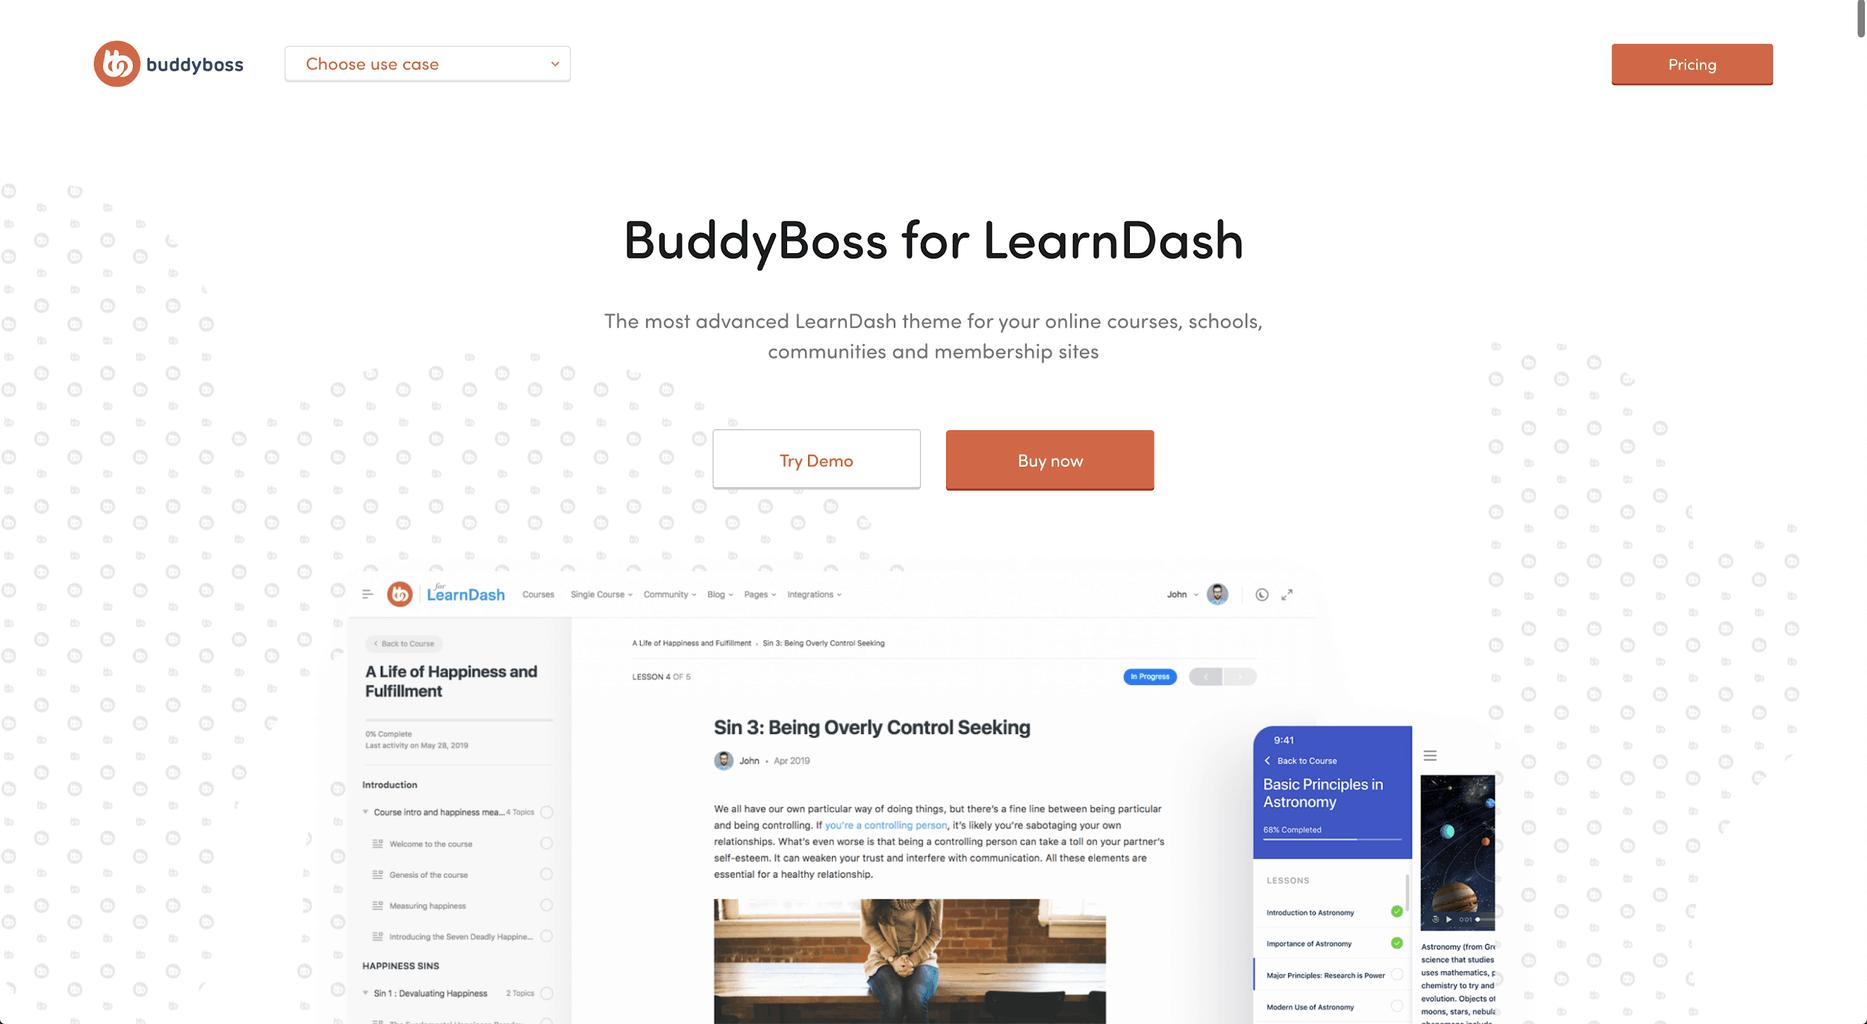 BuddyBoss integrating with LearnDash